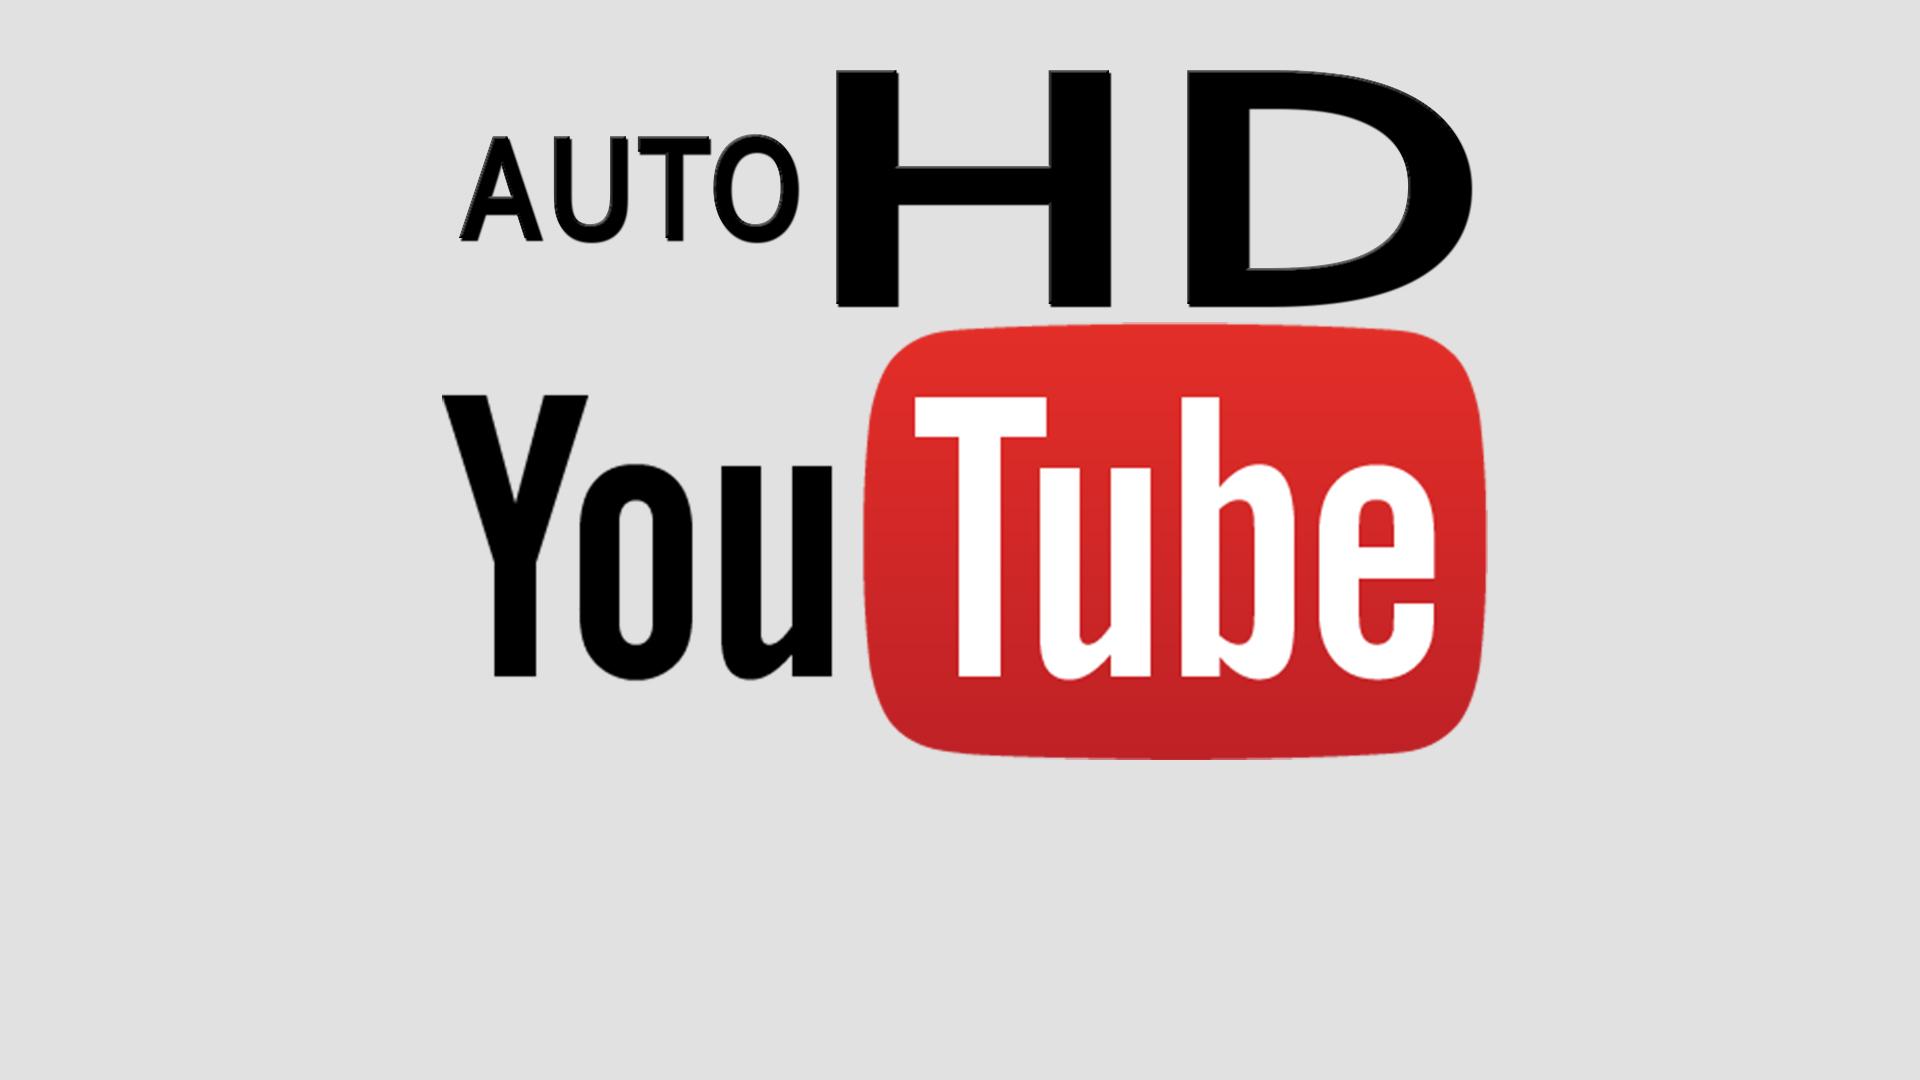 youtube videos default play in hd vizfact net